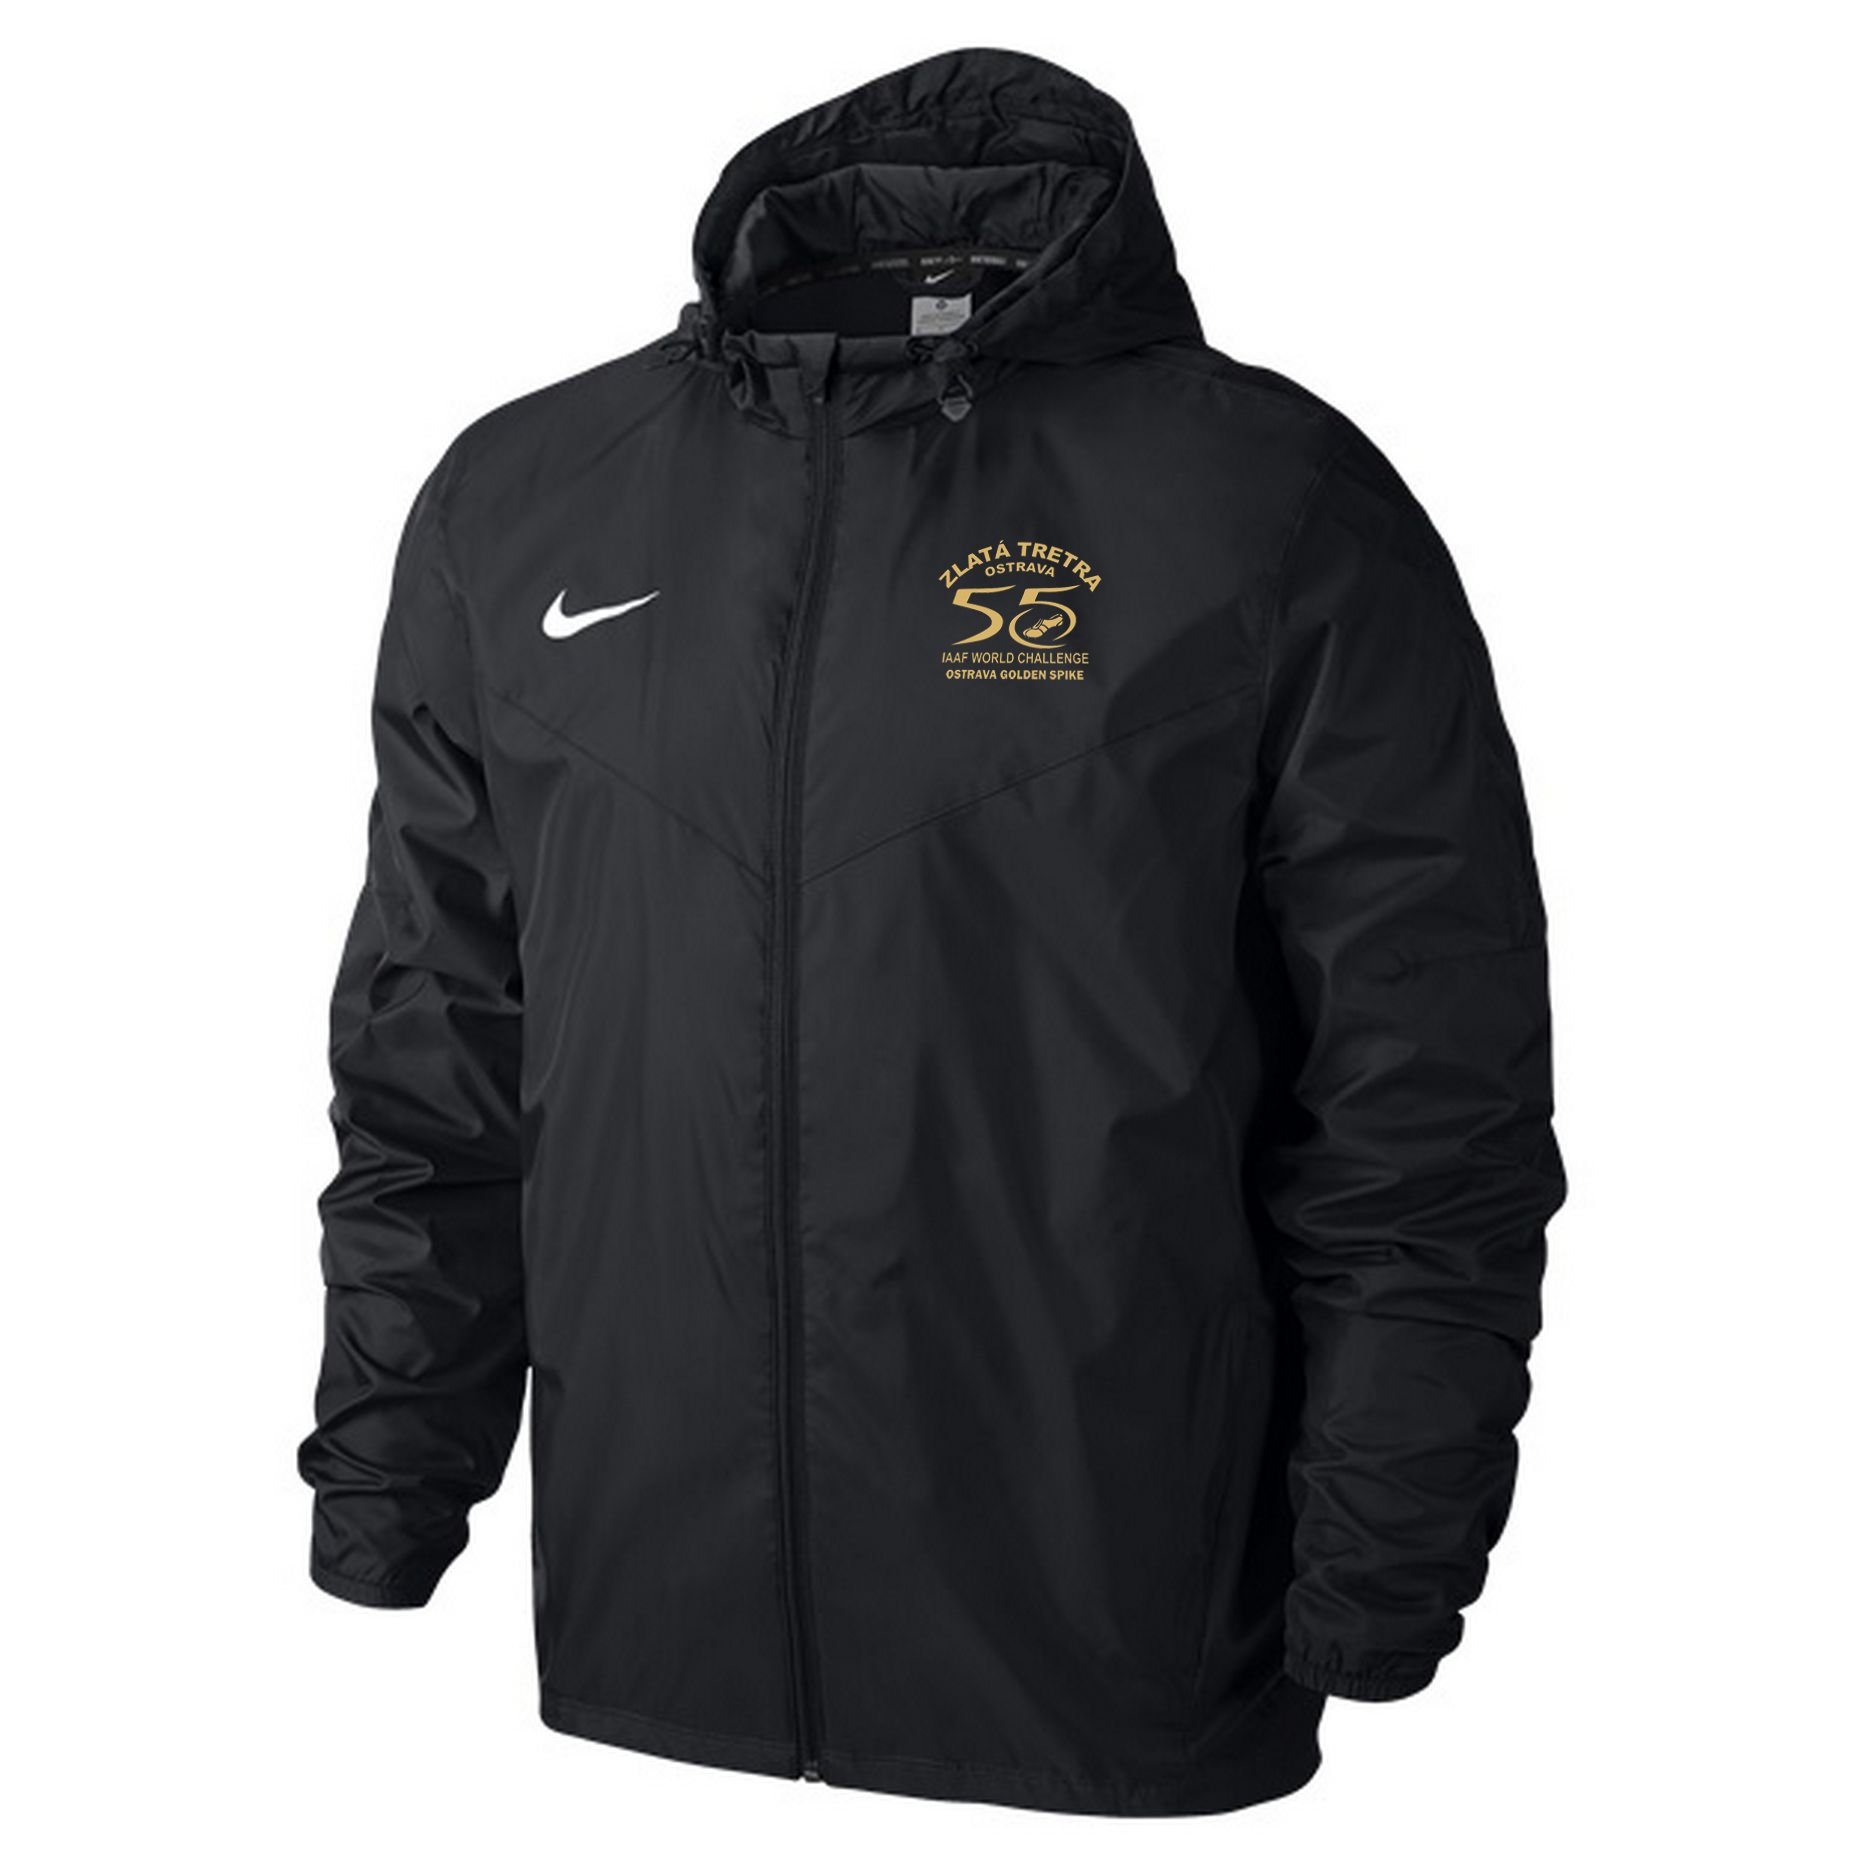 Bunda s kapucí Nike Team Sideline Rain Jacket Zlata tretra